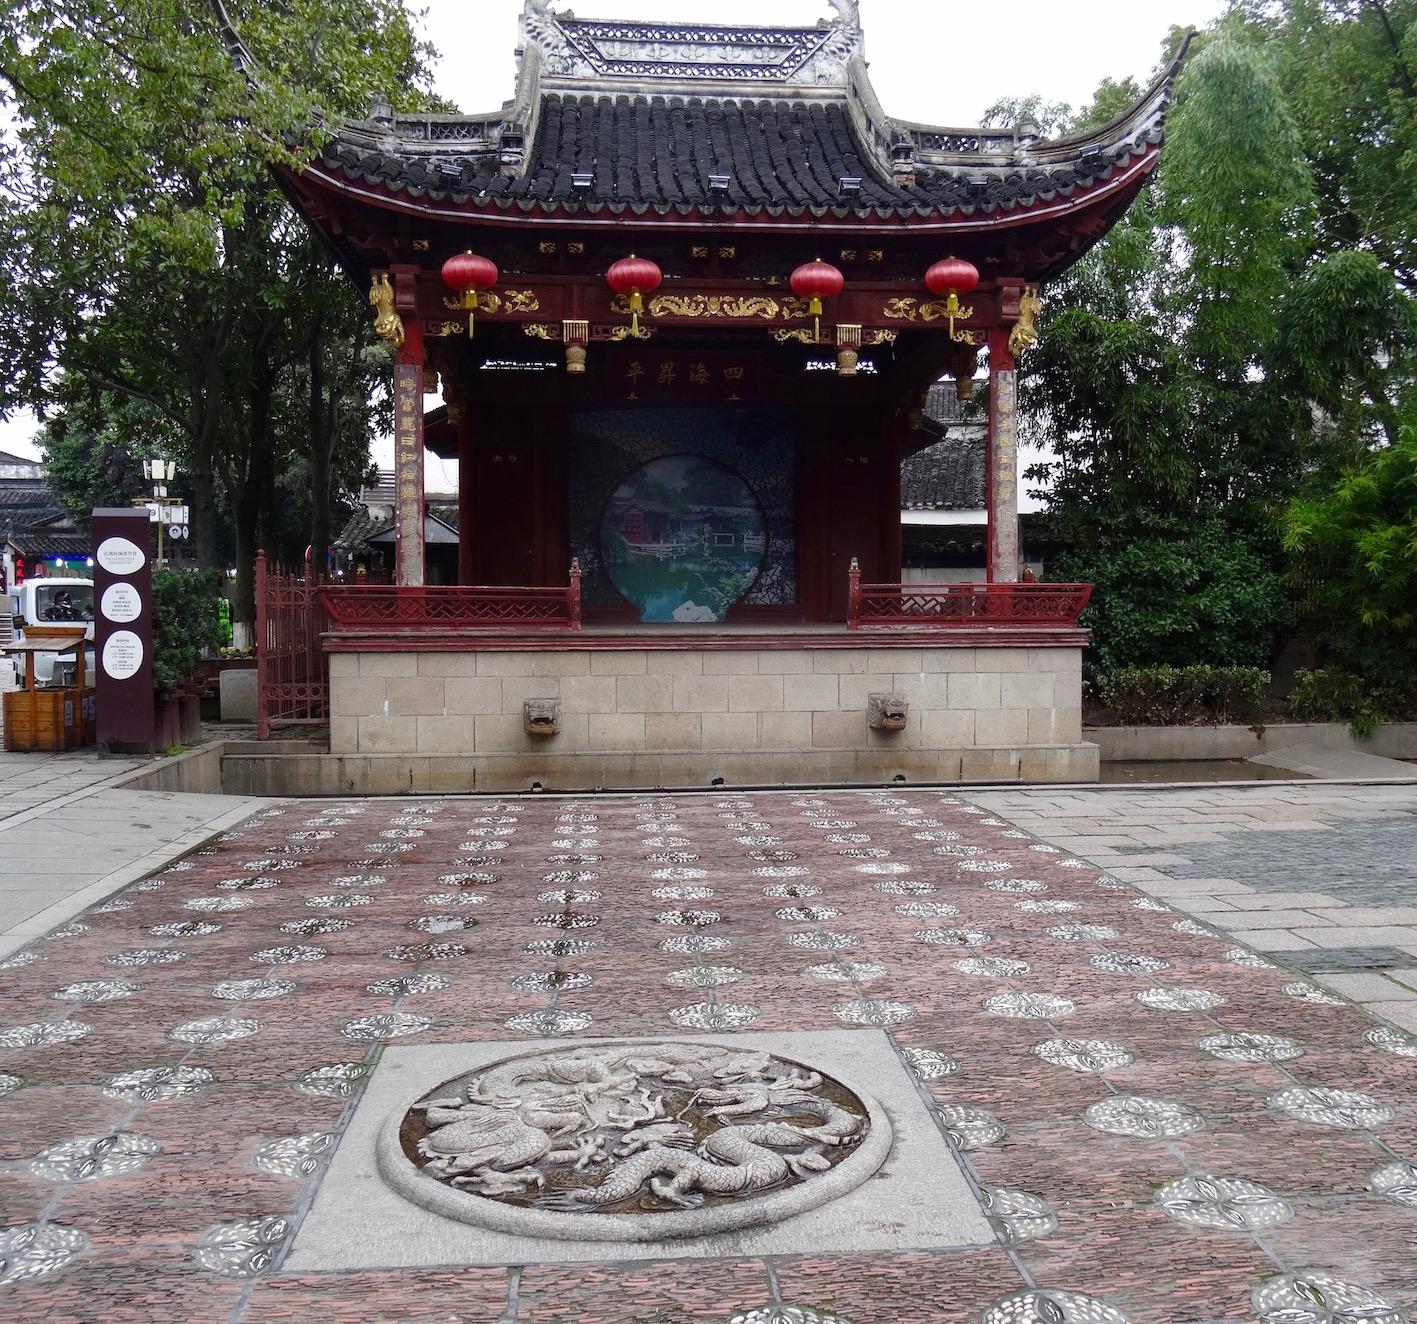 Stage performances Tongli Water Town Suzhou China